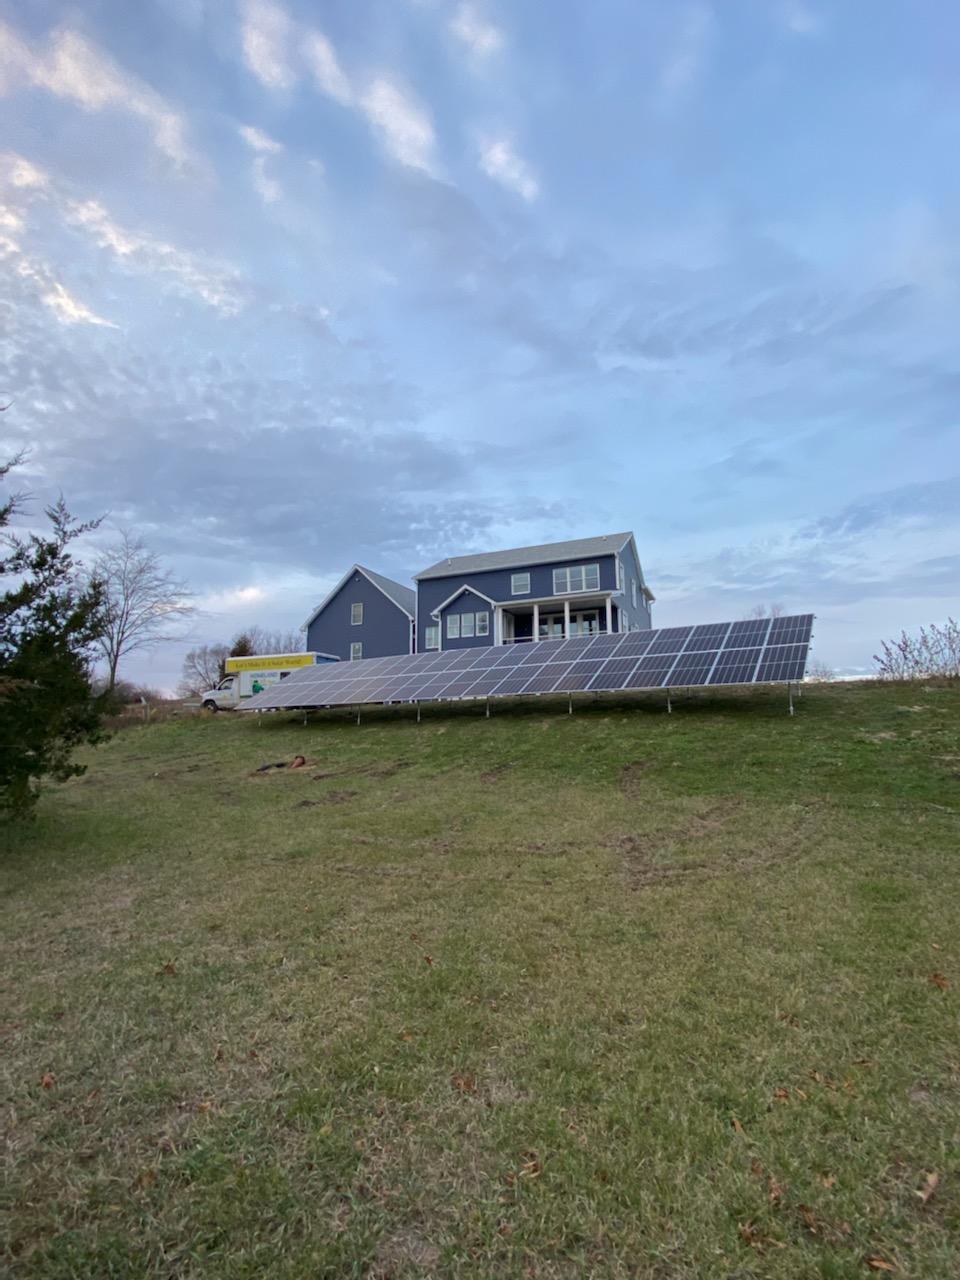 Residential Ground Mount of Solar Panels